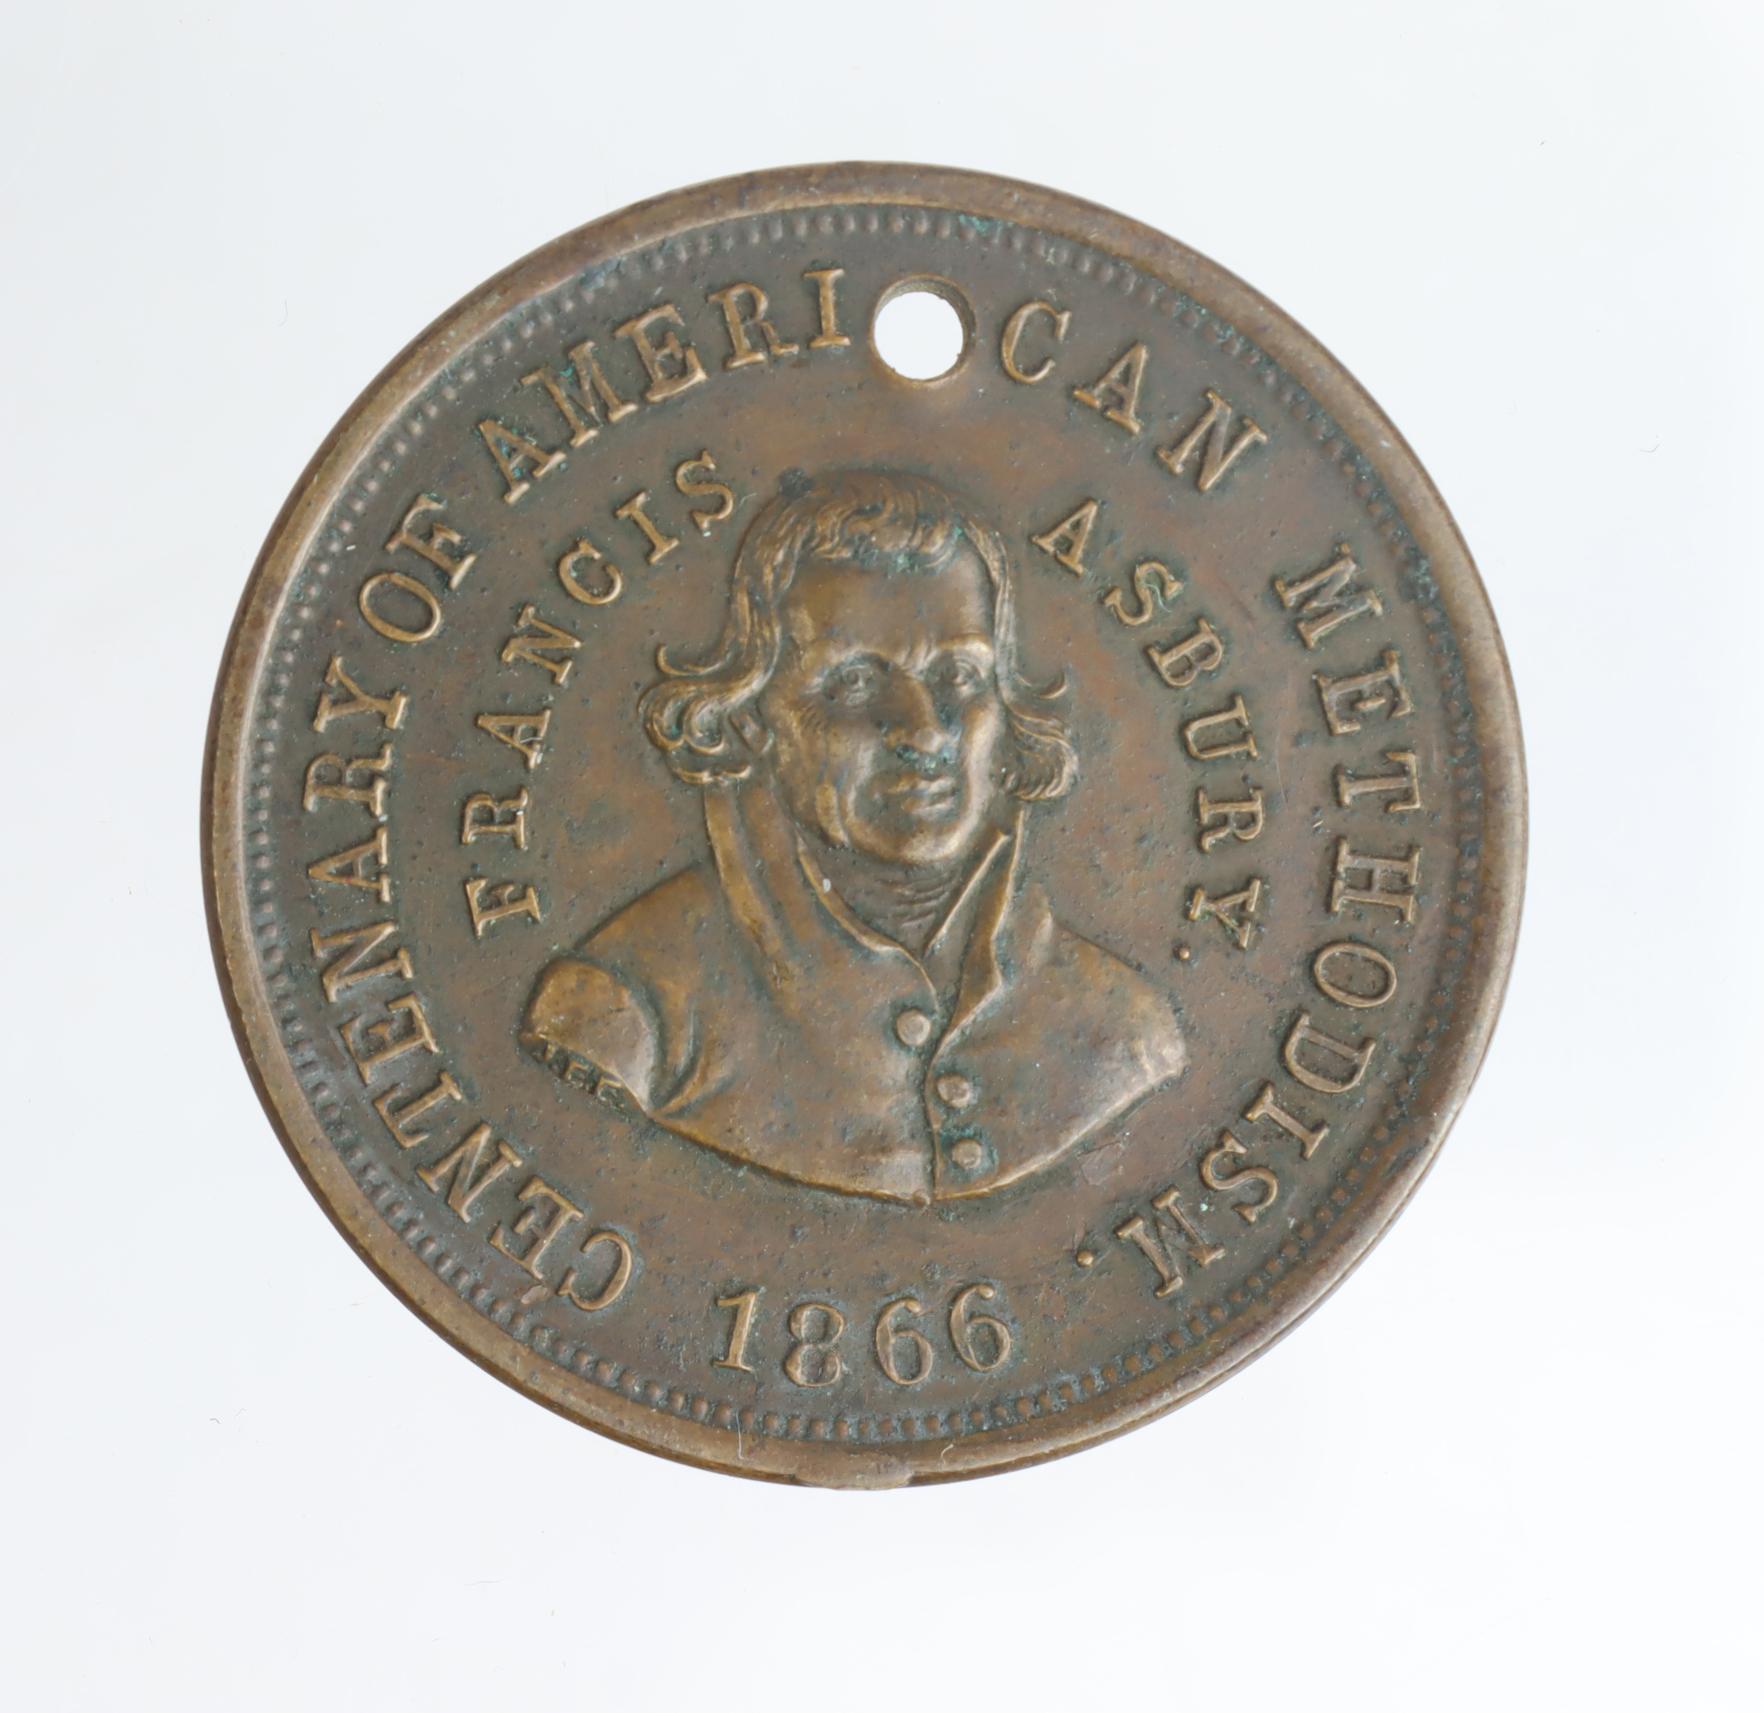 USA, Centenary of Amercian Methodism, Francis Ashbury 1866 / Childrens Medal. Copper d.30mm. NEF,